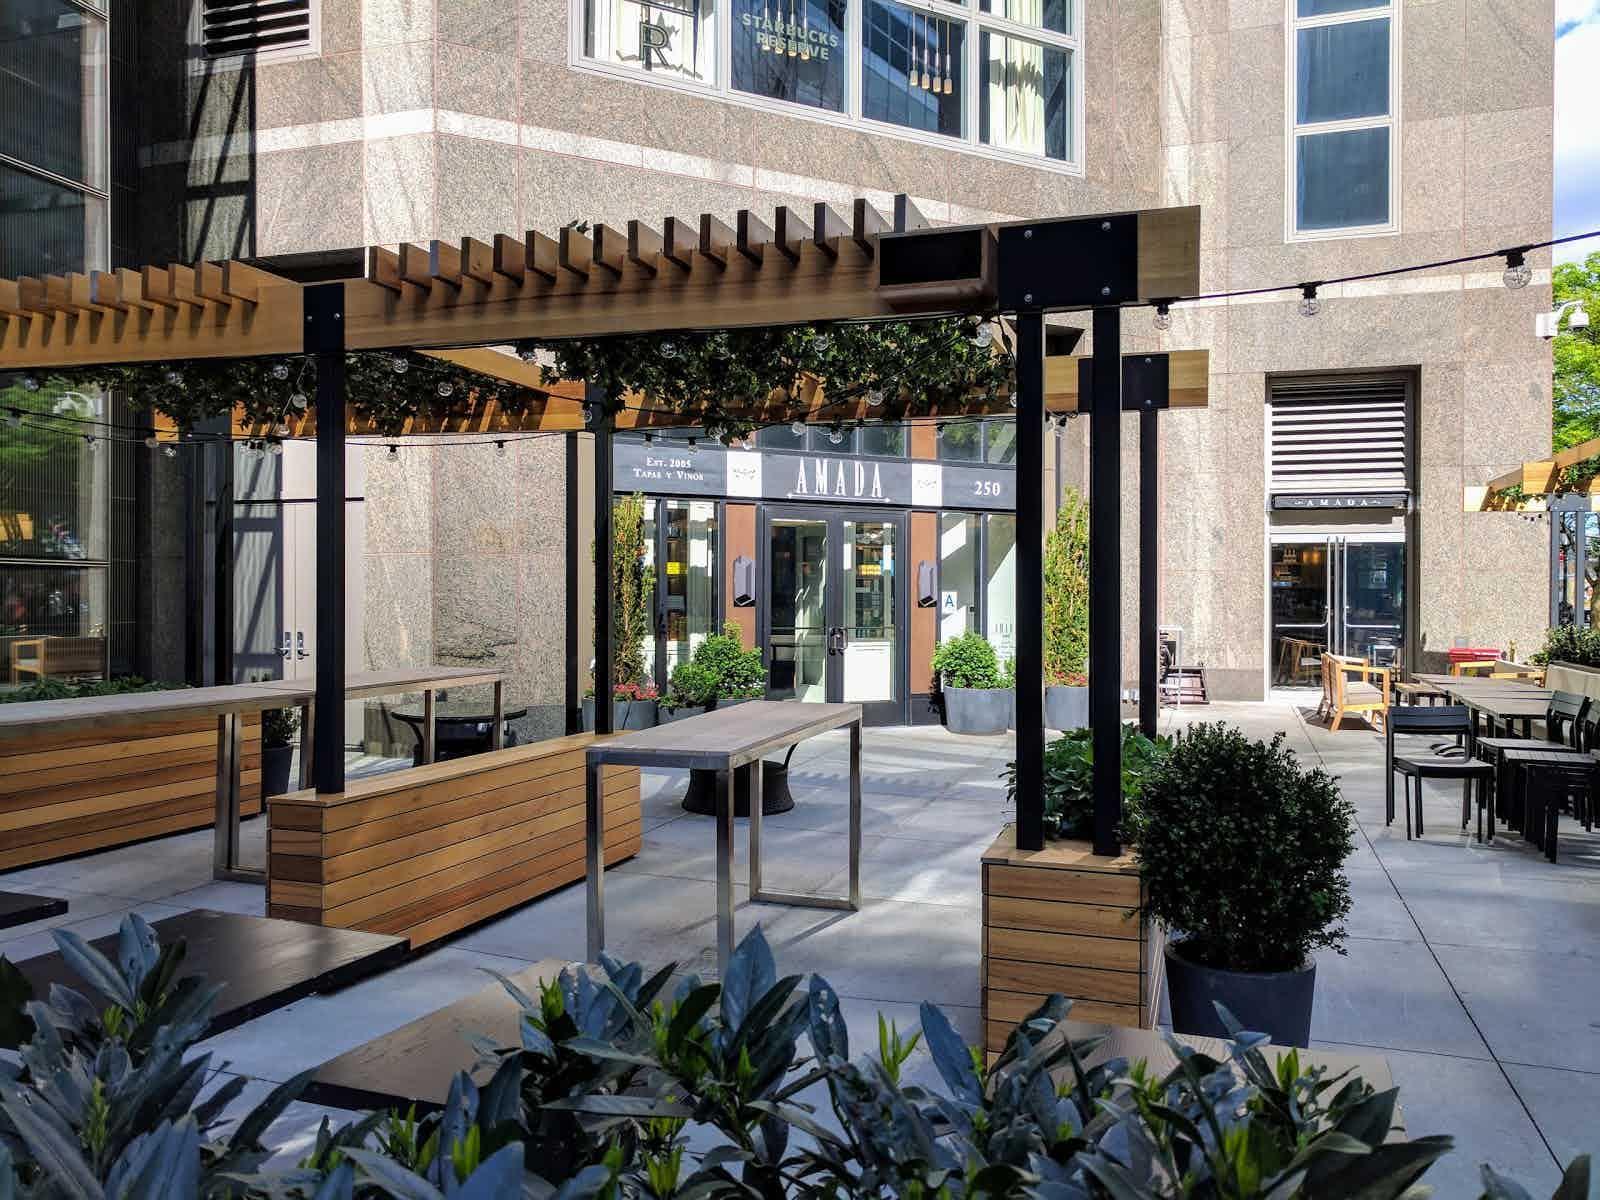 AMADA - New York | Restaurant Review - Zagat